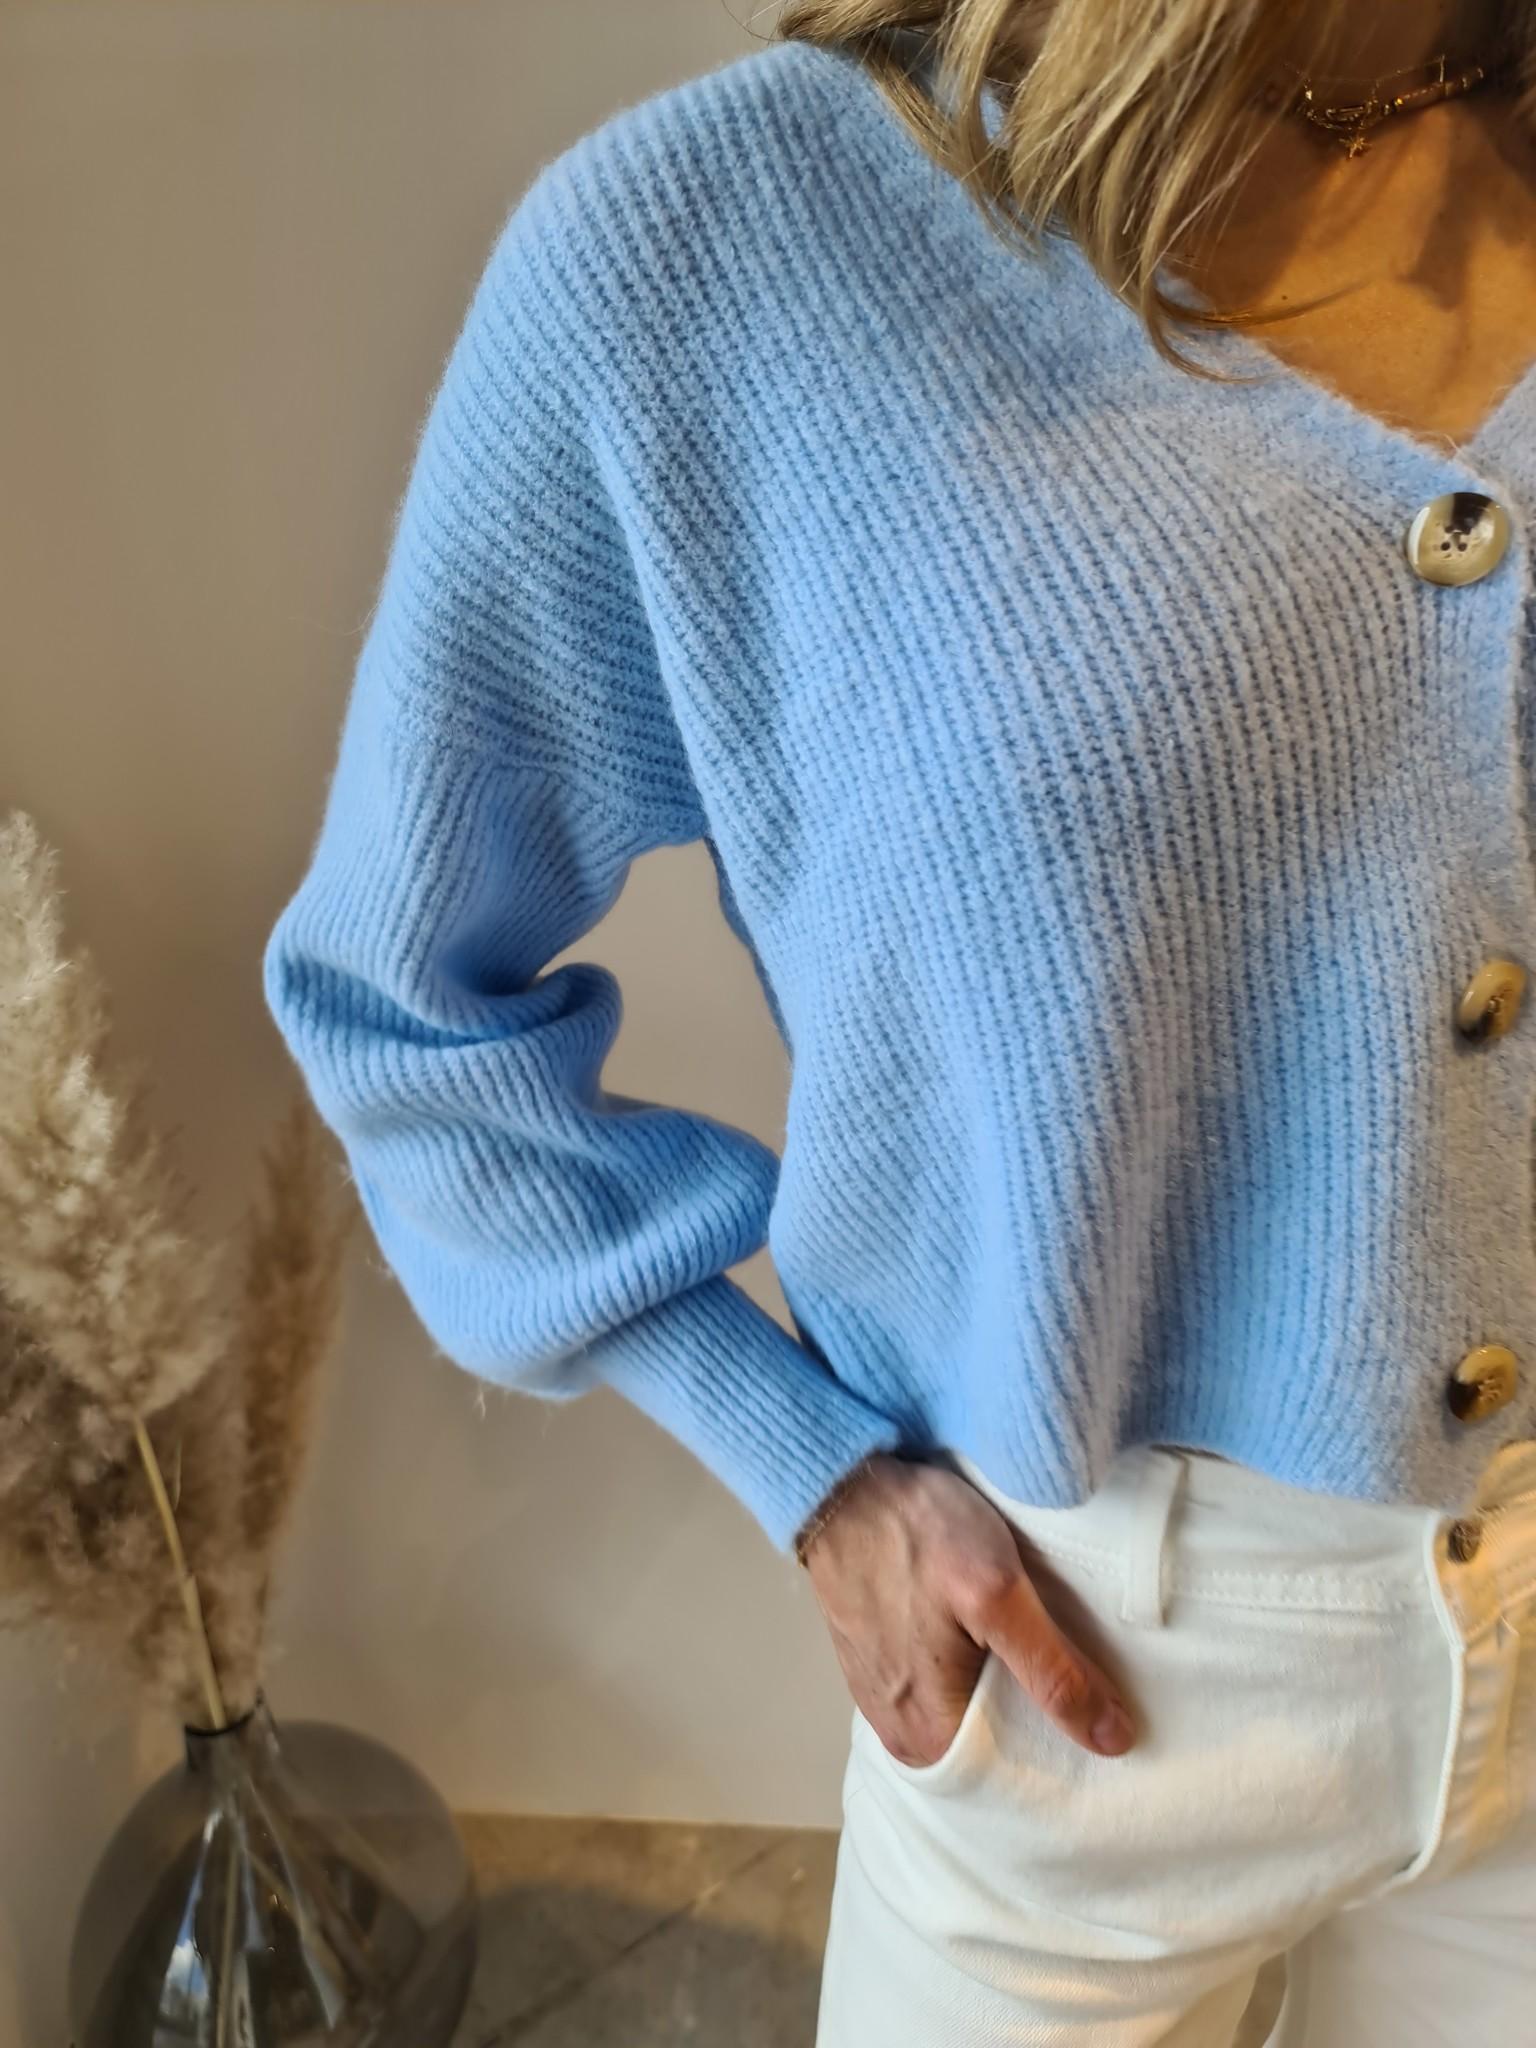 TRENDY gilet bleu ciel-5